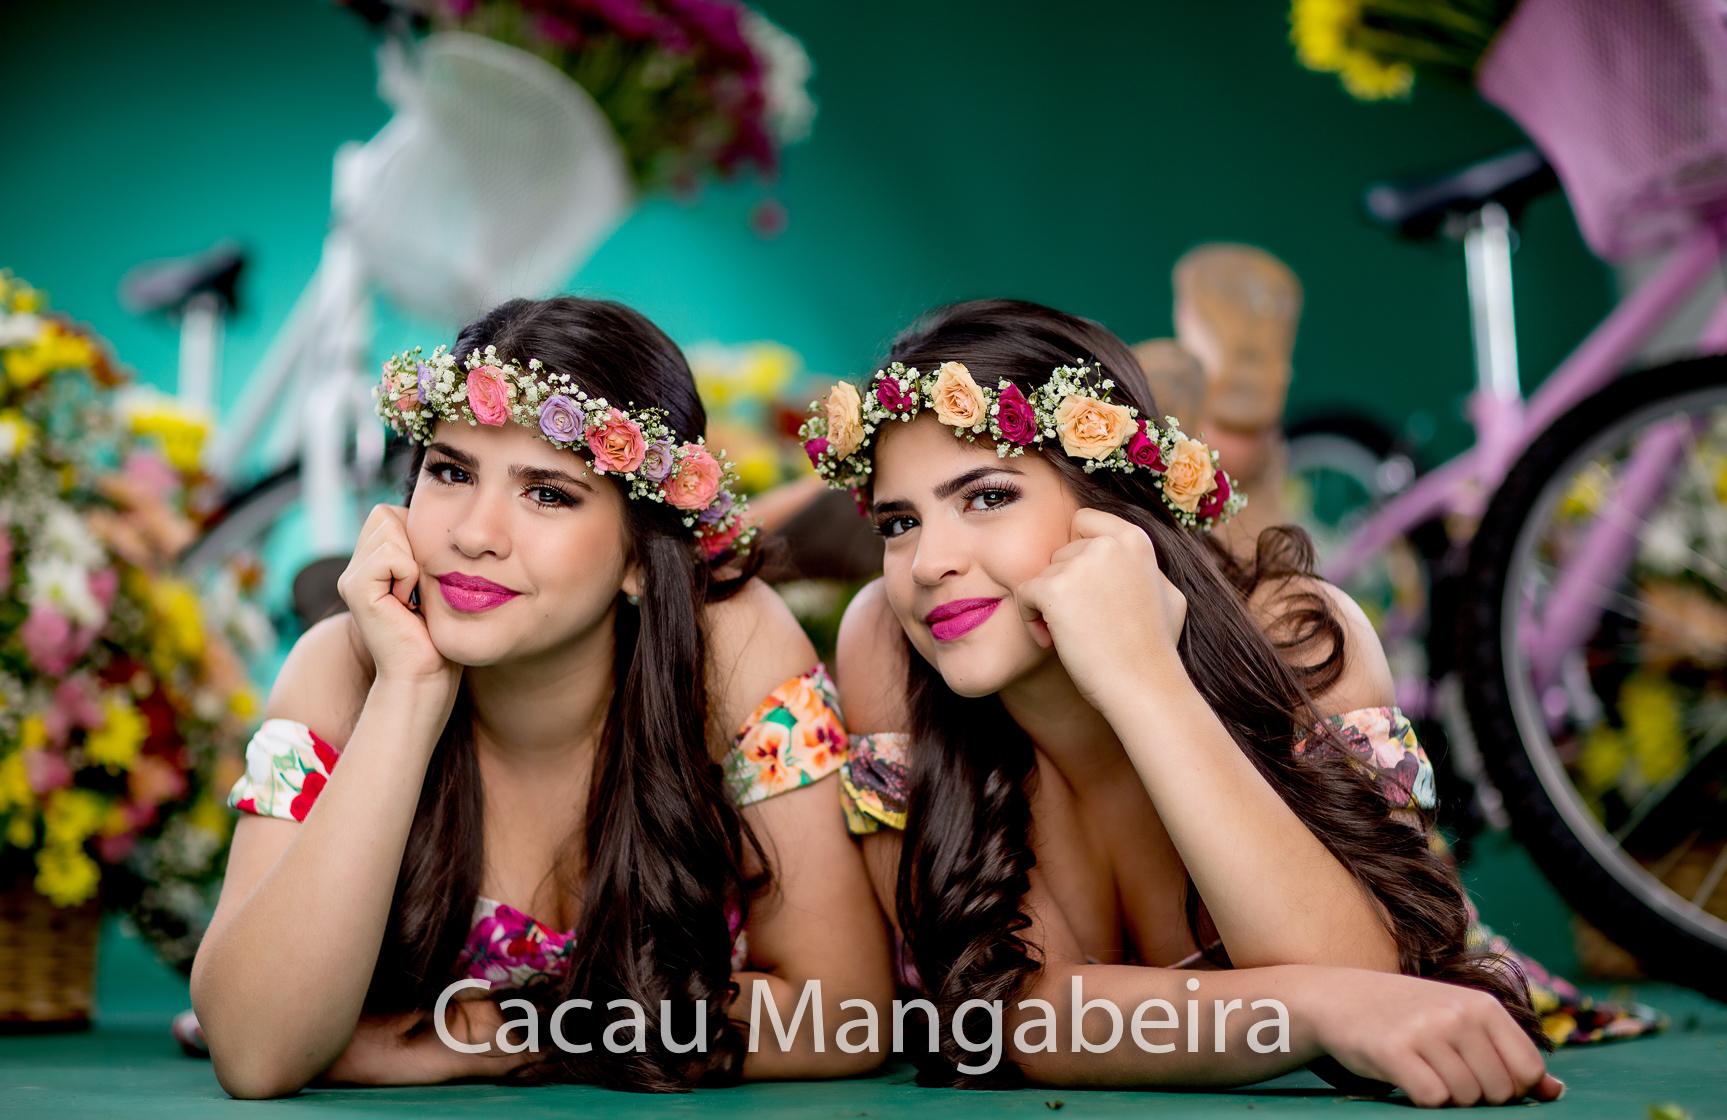 Amanda e Vitoria - Cacau Mangabeira